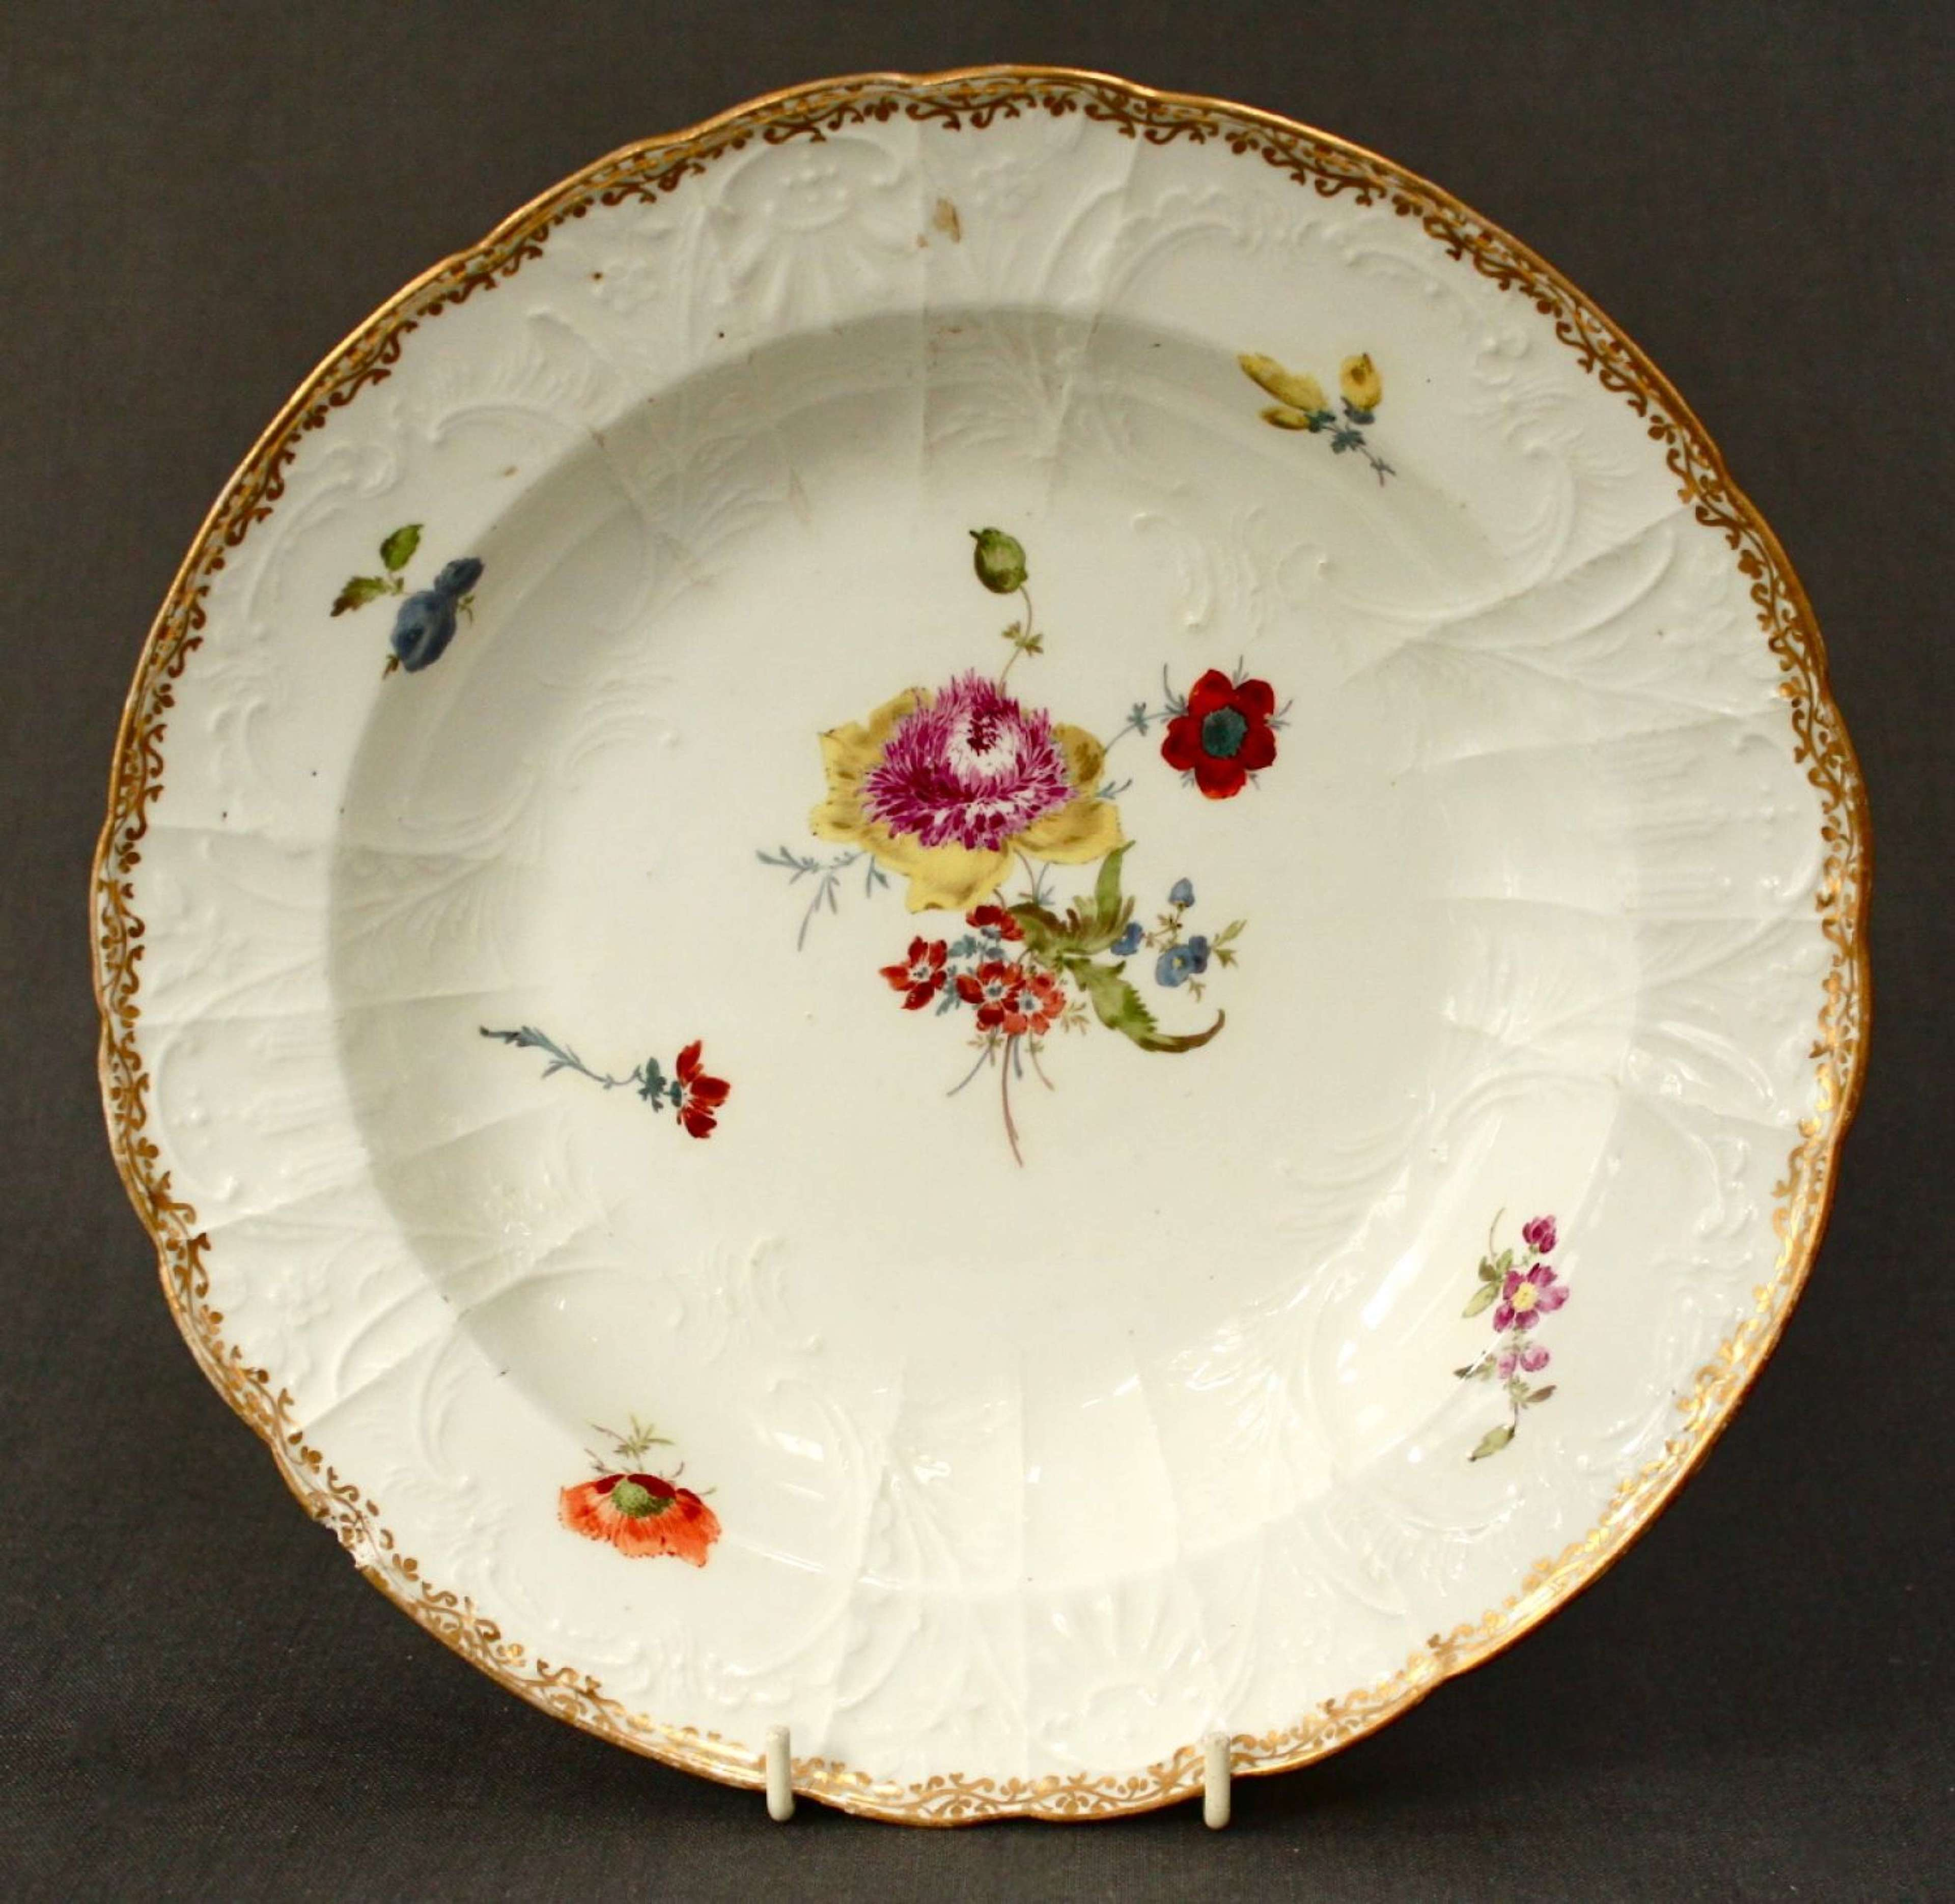 An 18th Century Meissen soup plate